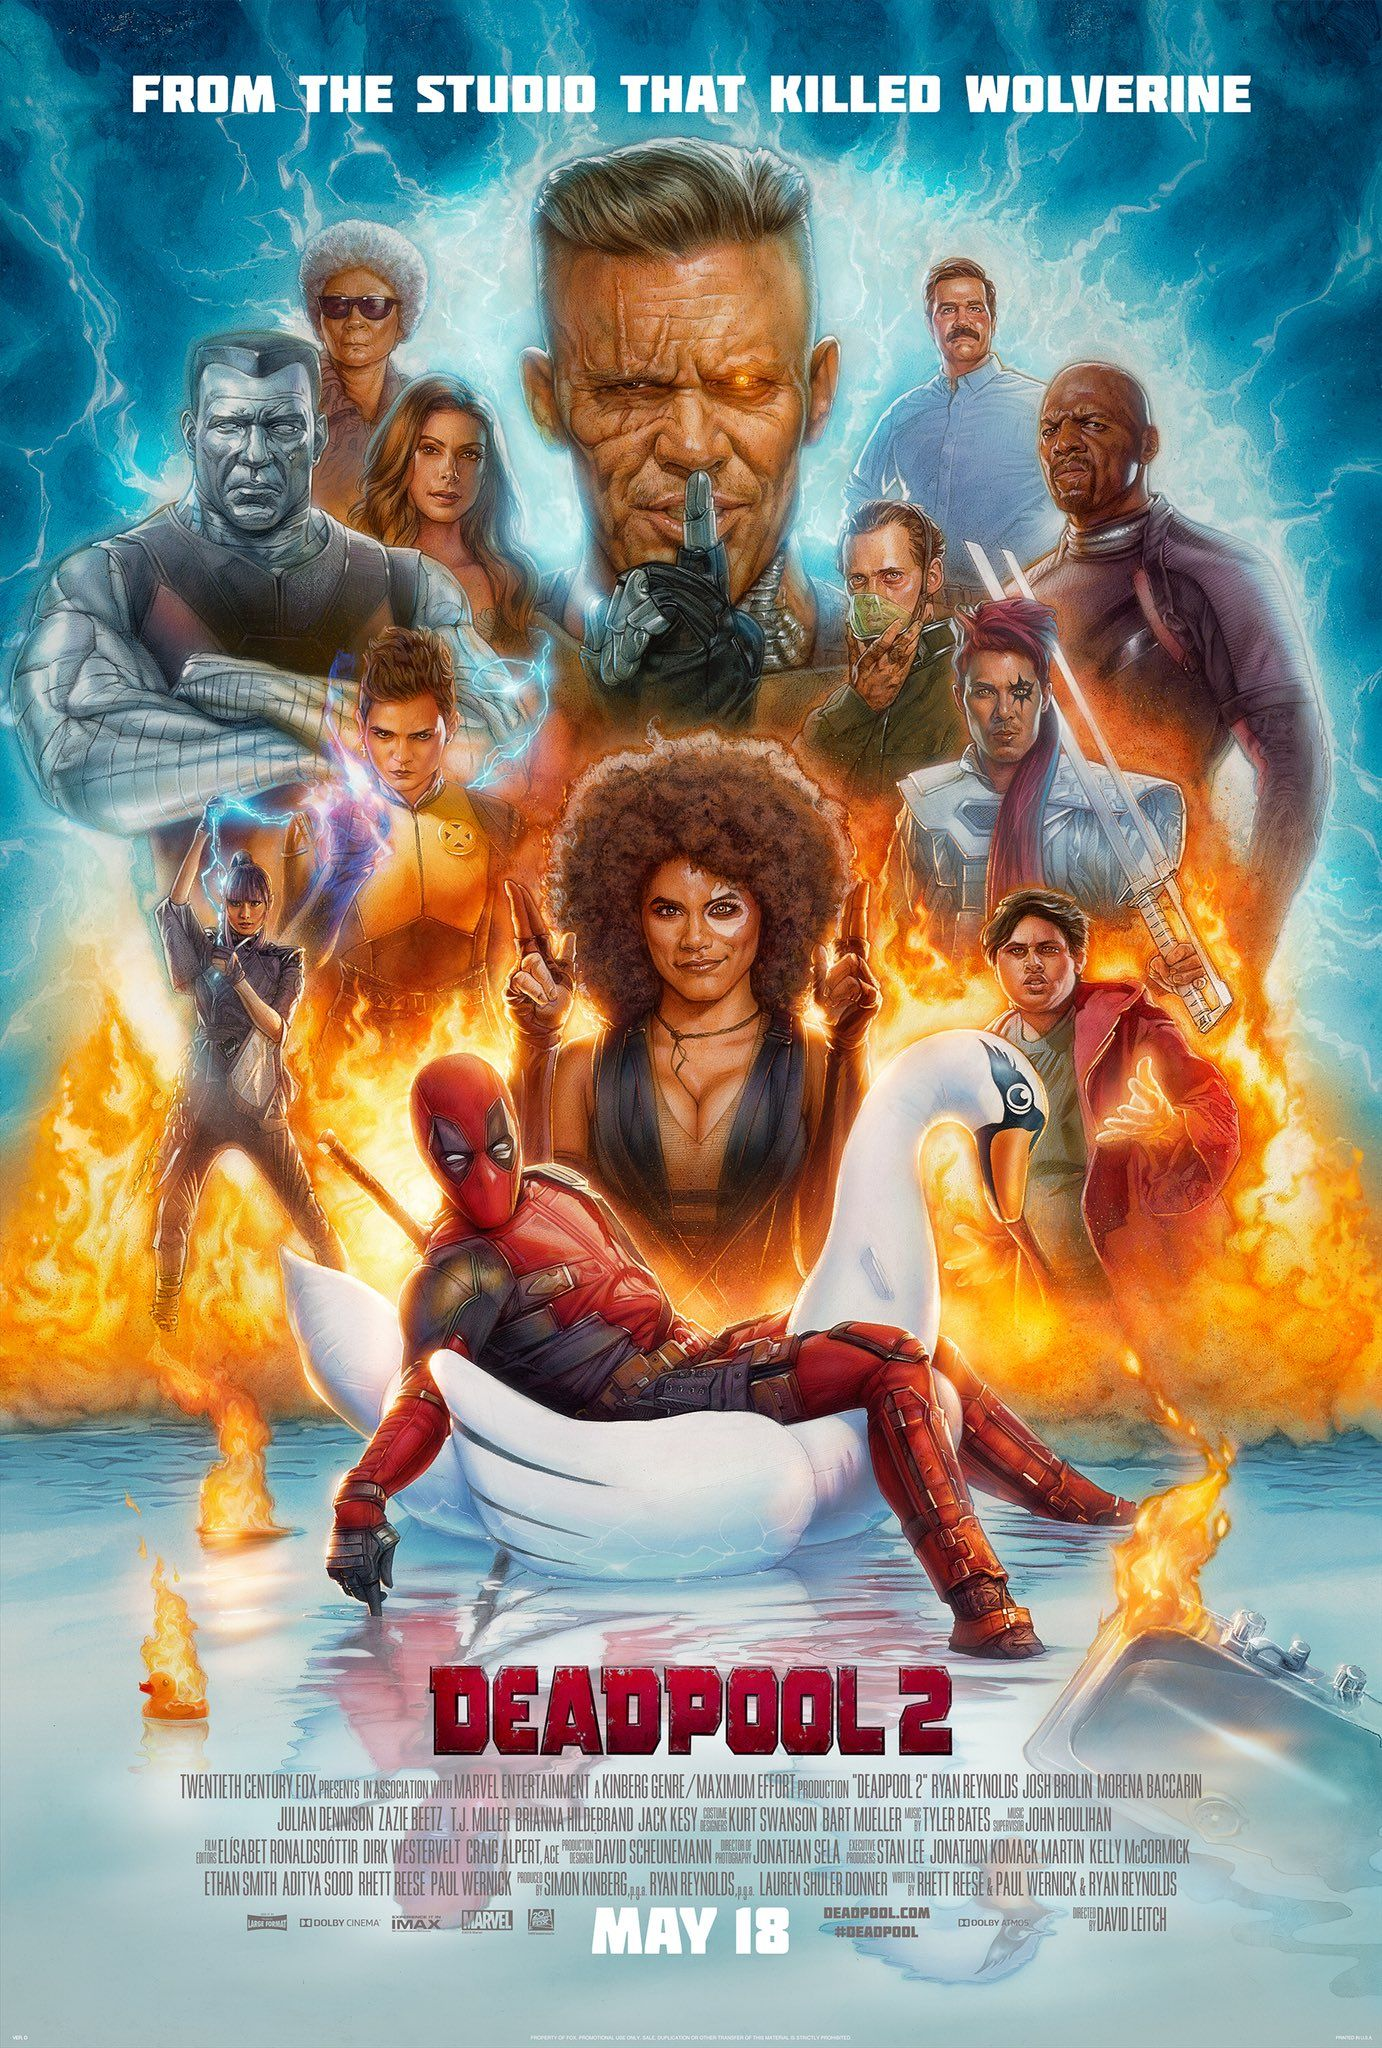 Ryan Reynolds On Twitter May 18 Tickets At Https T Co W2cjp46in9 Deadpool2 Deadpool 2 Movie Deadpool 2 Poster 2018 Movies